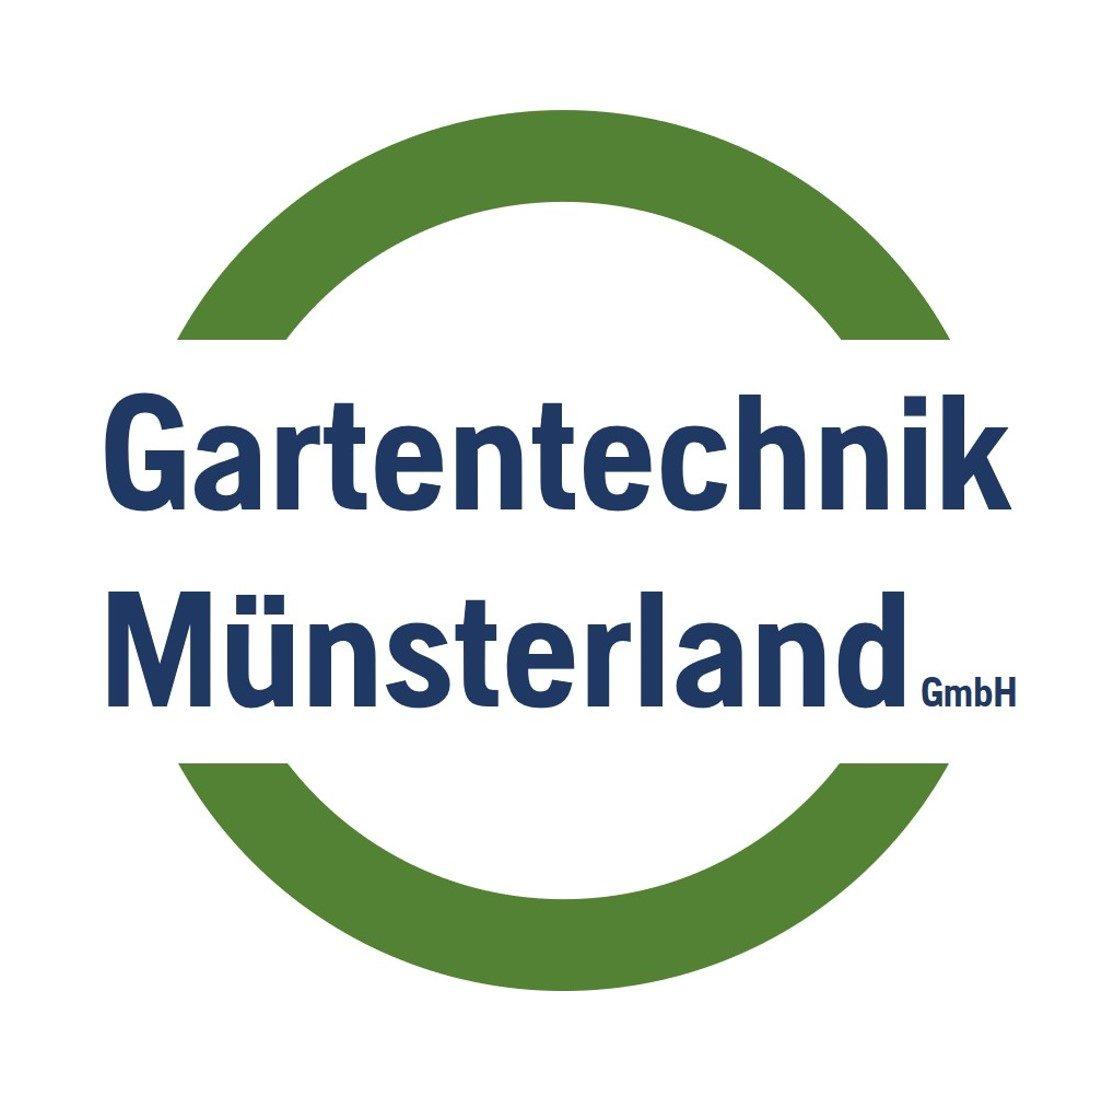 Gartentechnik Münsterland